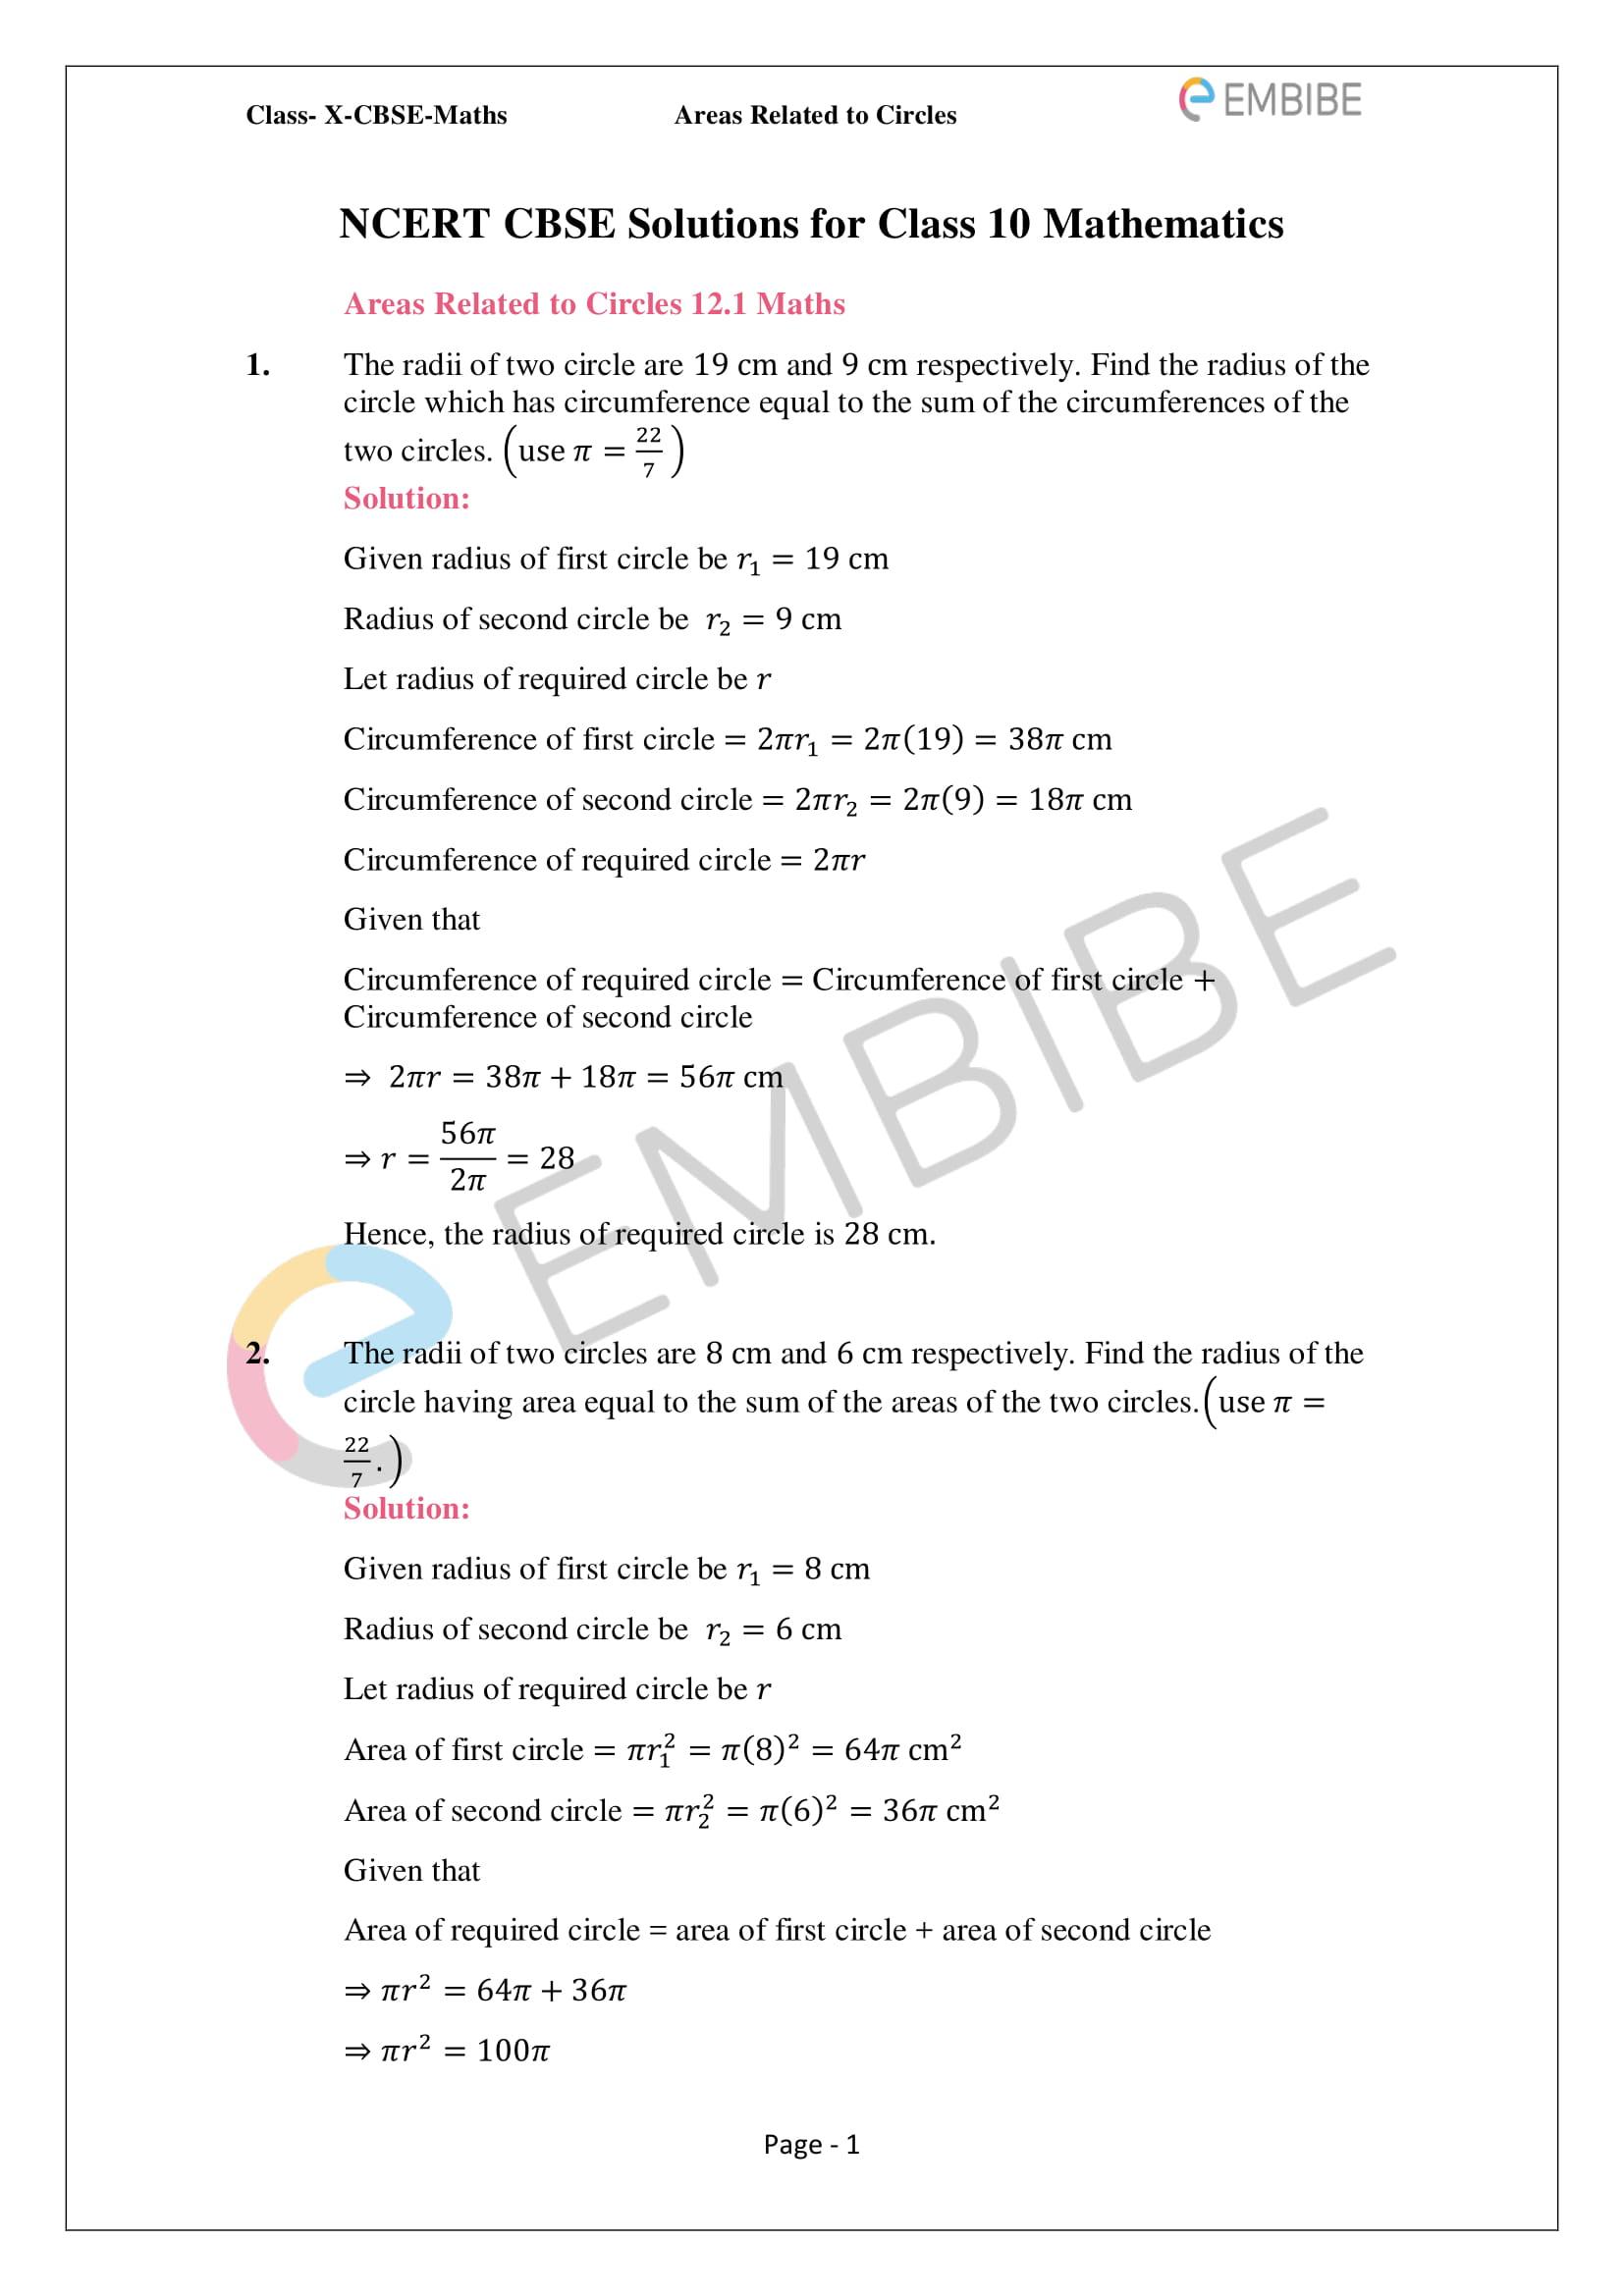 ncert solutions for class 8 maths chapter 12 pdf